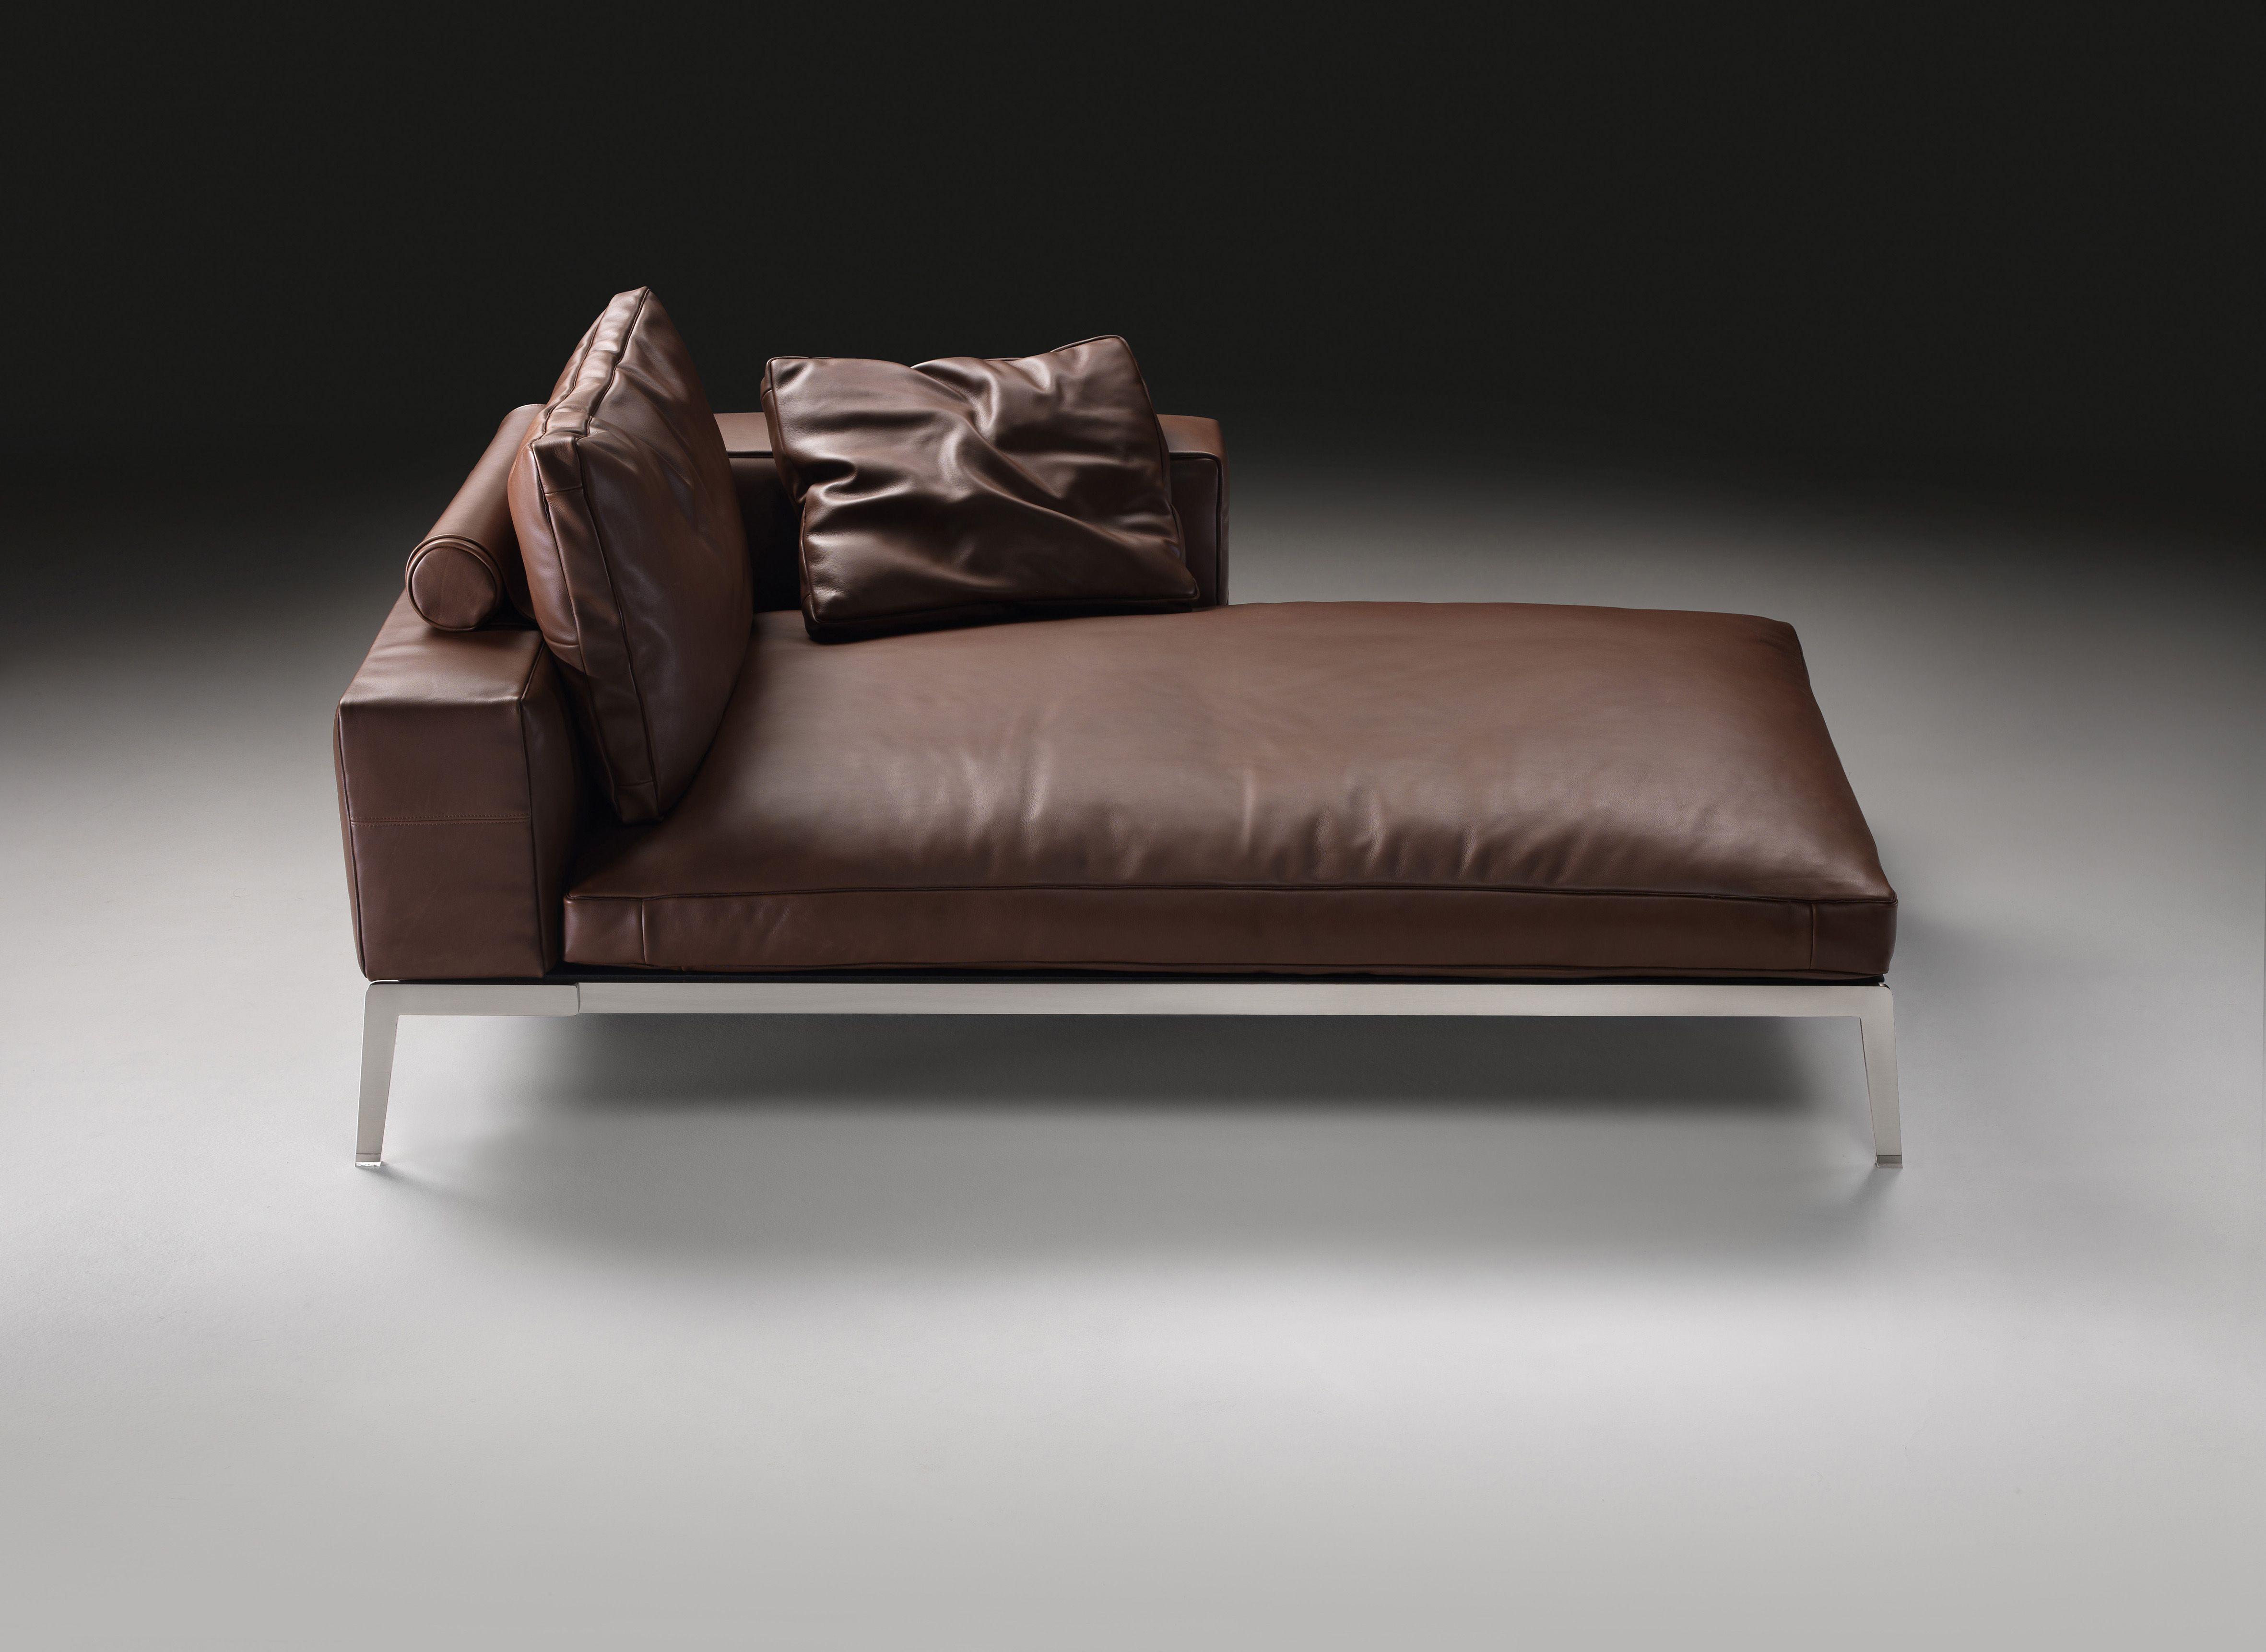 FLEXFORM LIFESTEEL chaiselongue Interiors Furniture